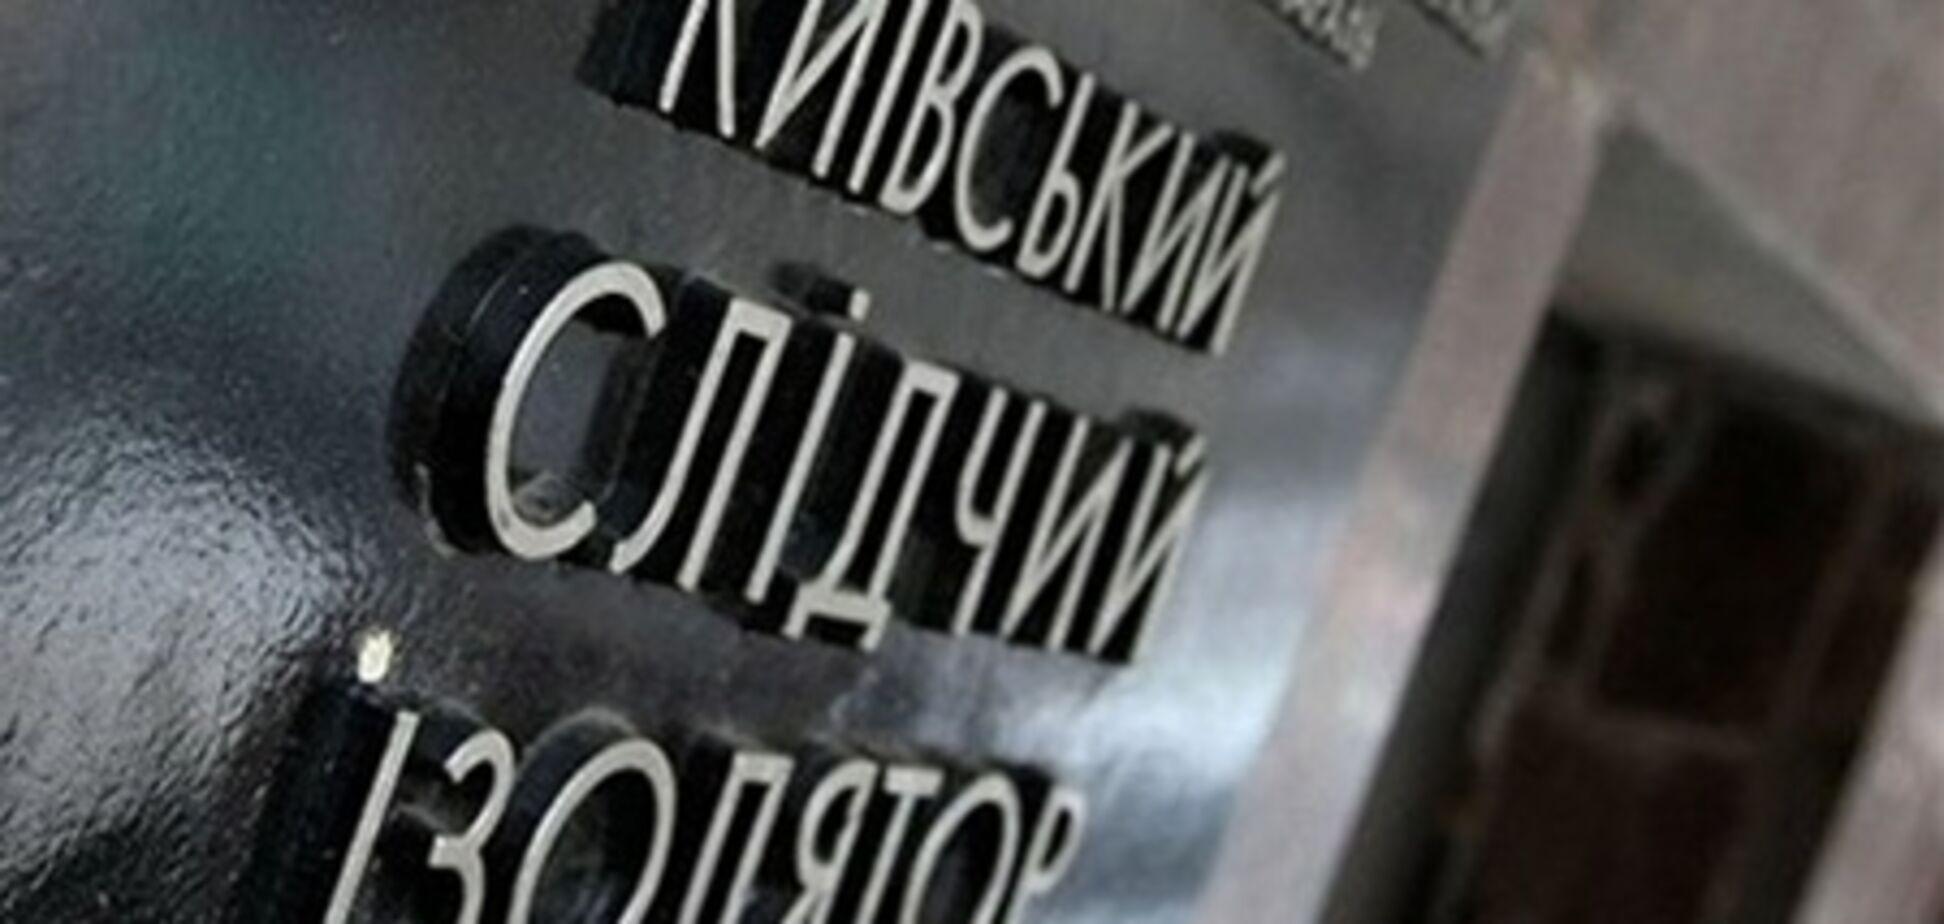 Лукьяновское СИЗО из-за убийства проверят